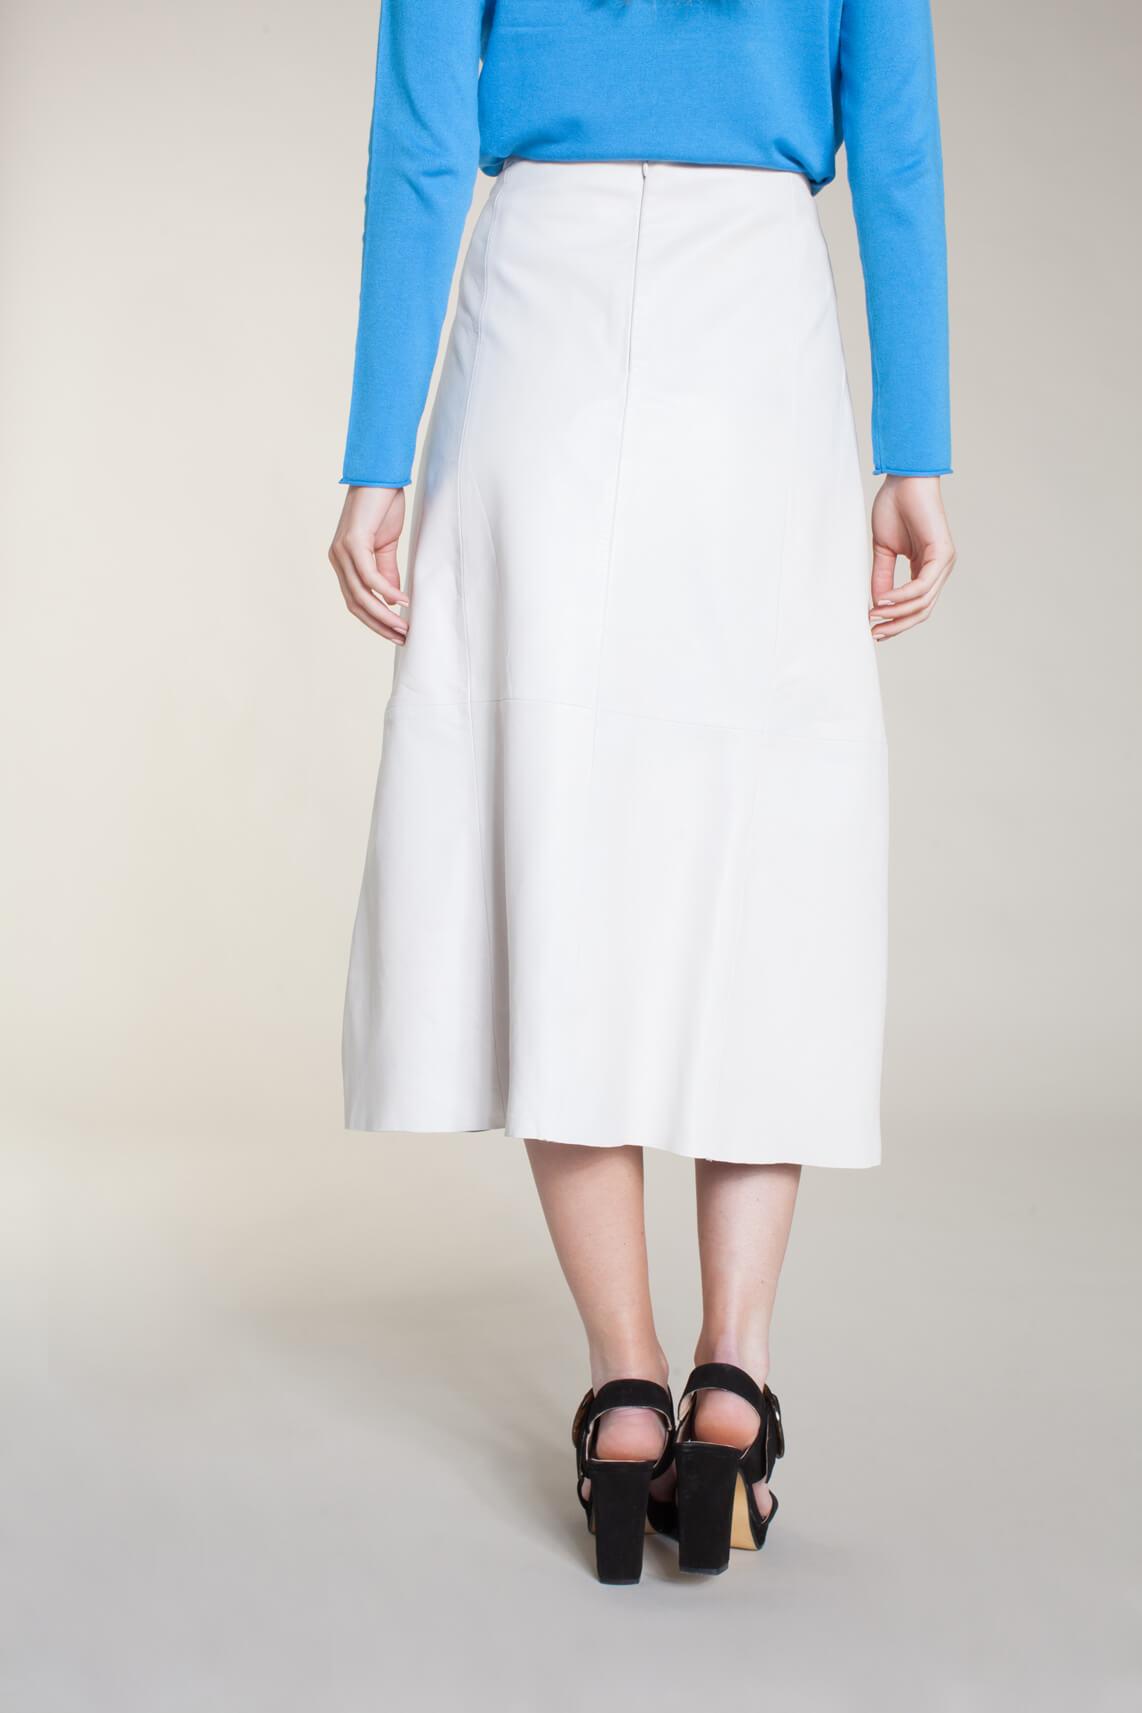 Anna Dames Lange leren rok wit